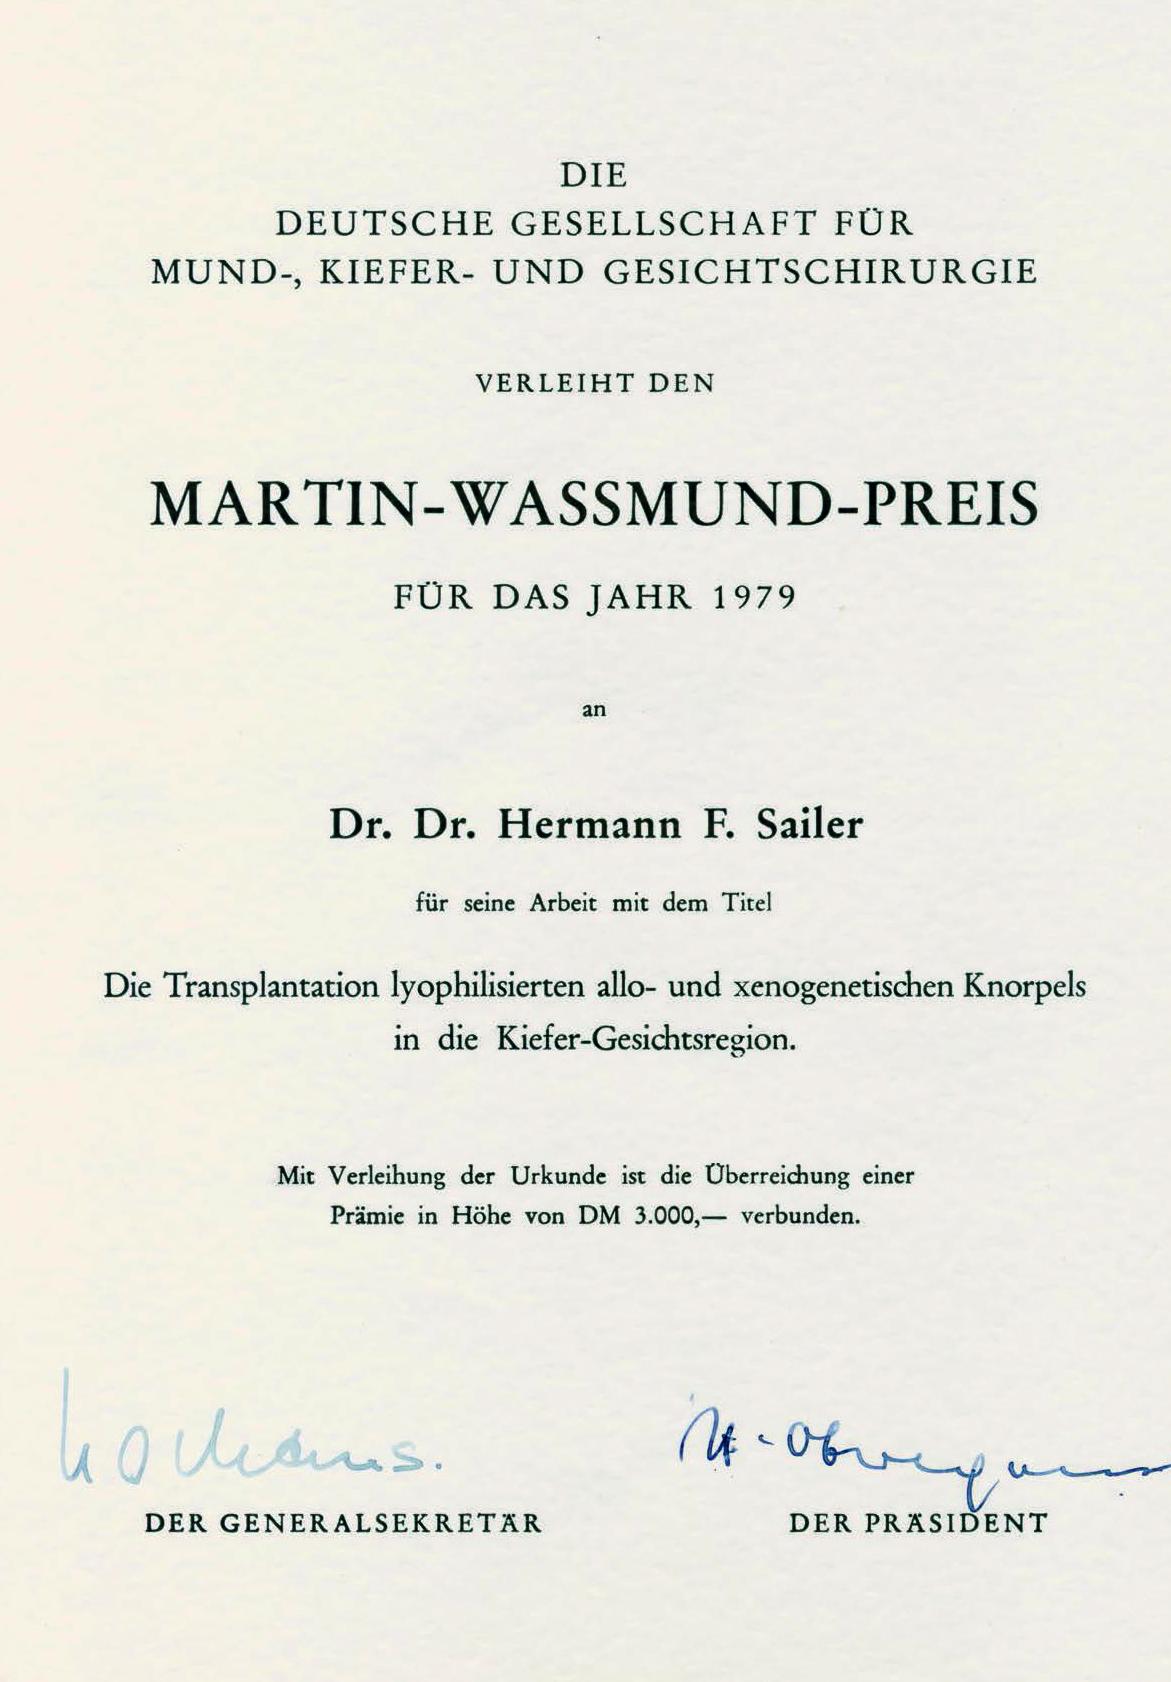 Sailerklinik: Awards